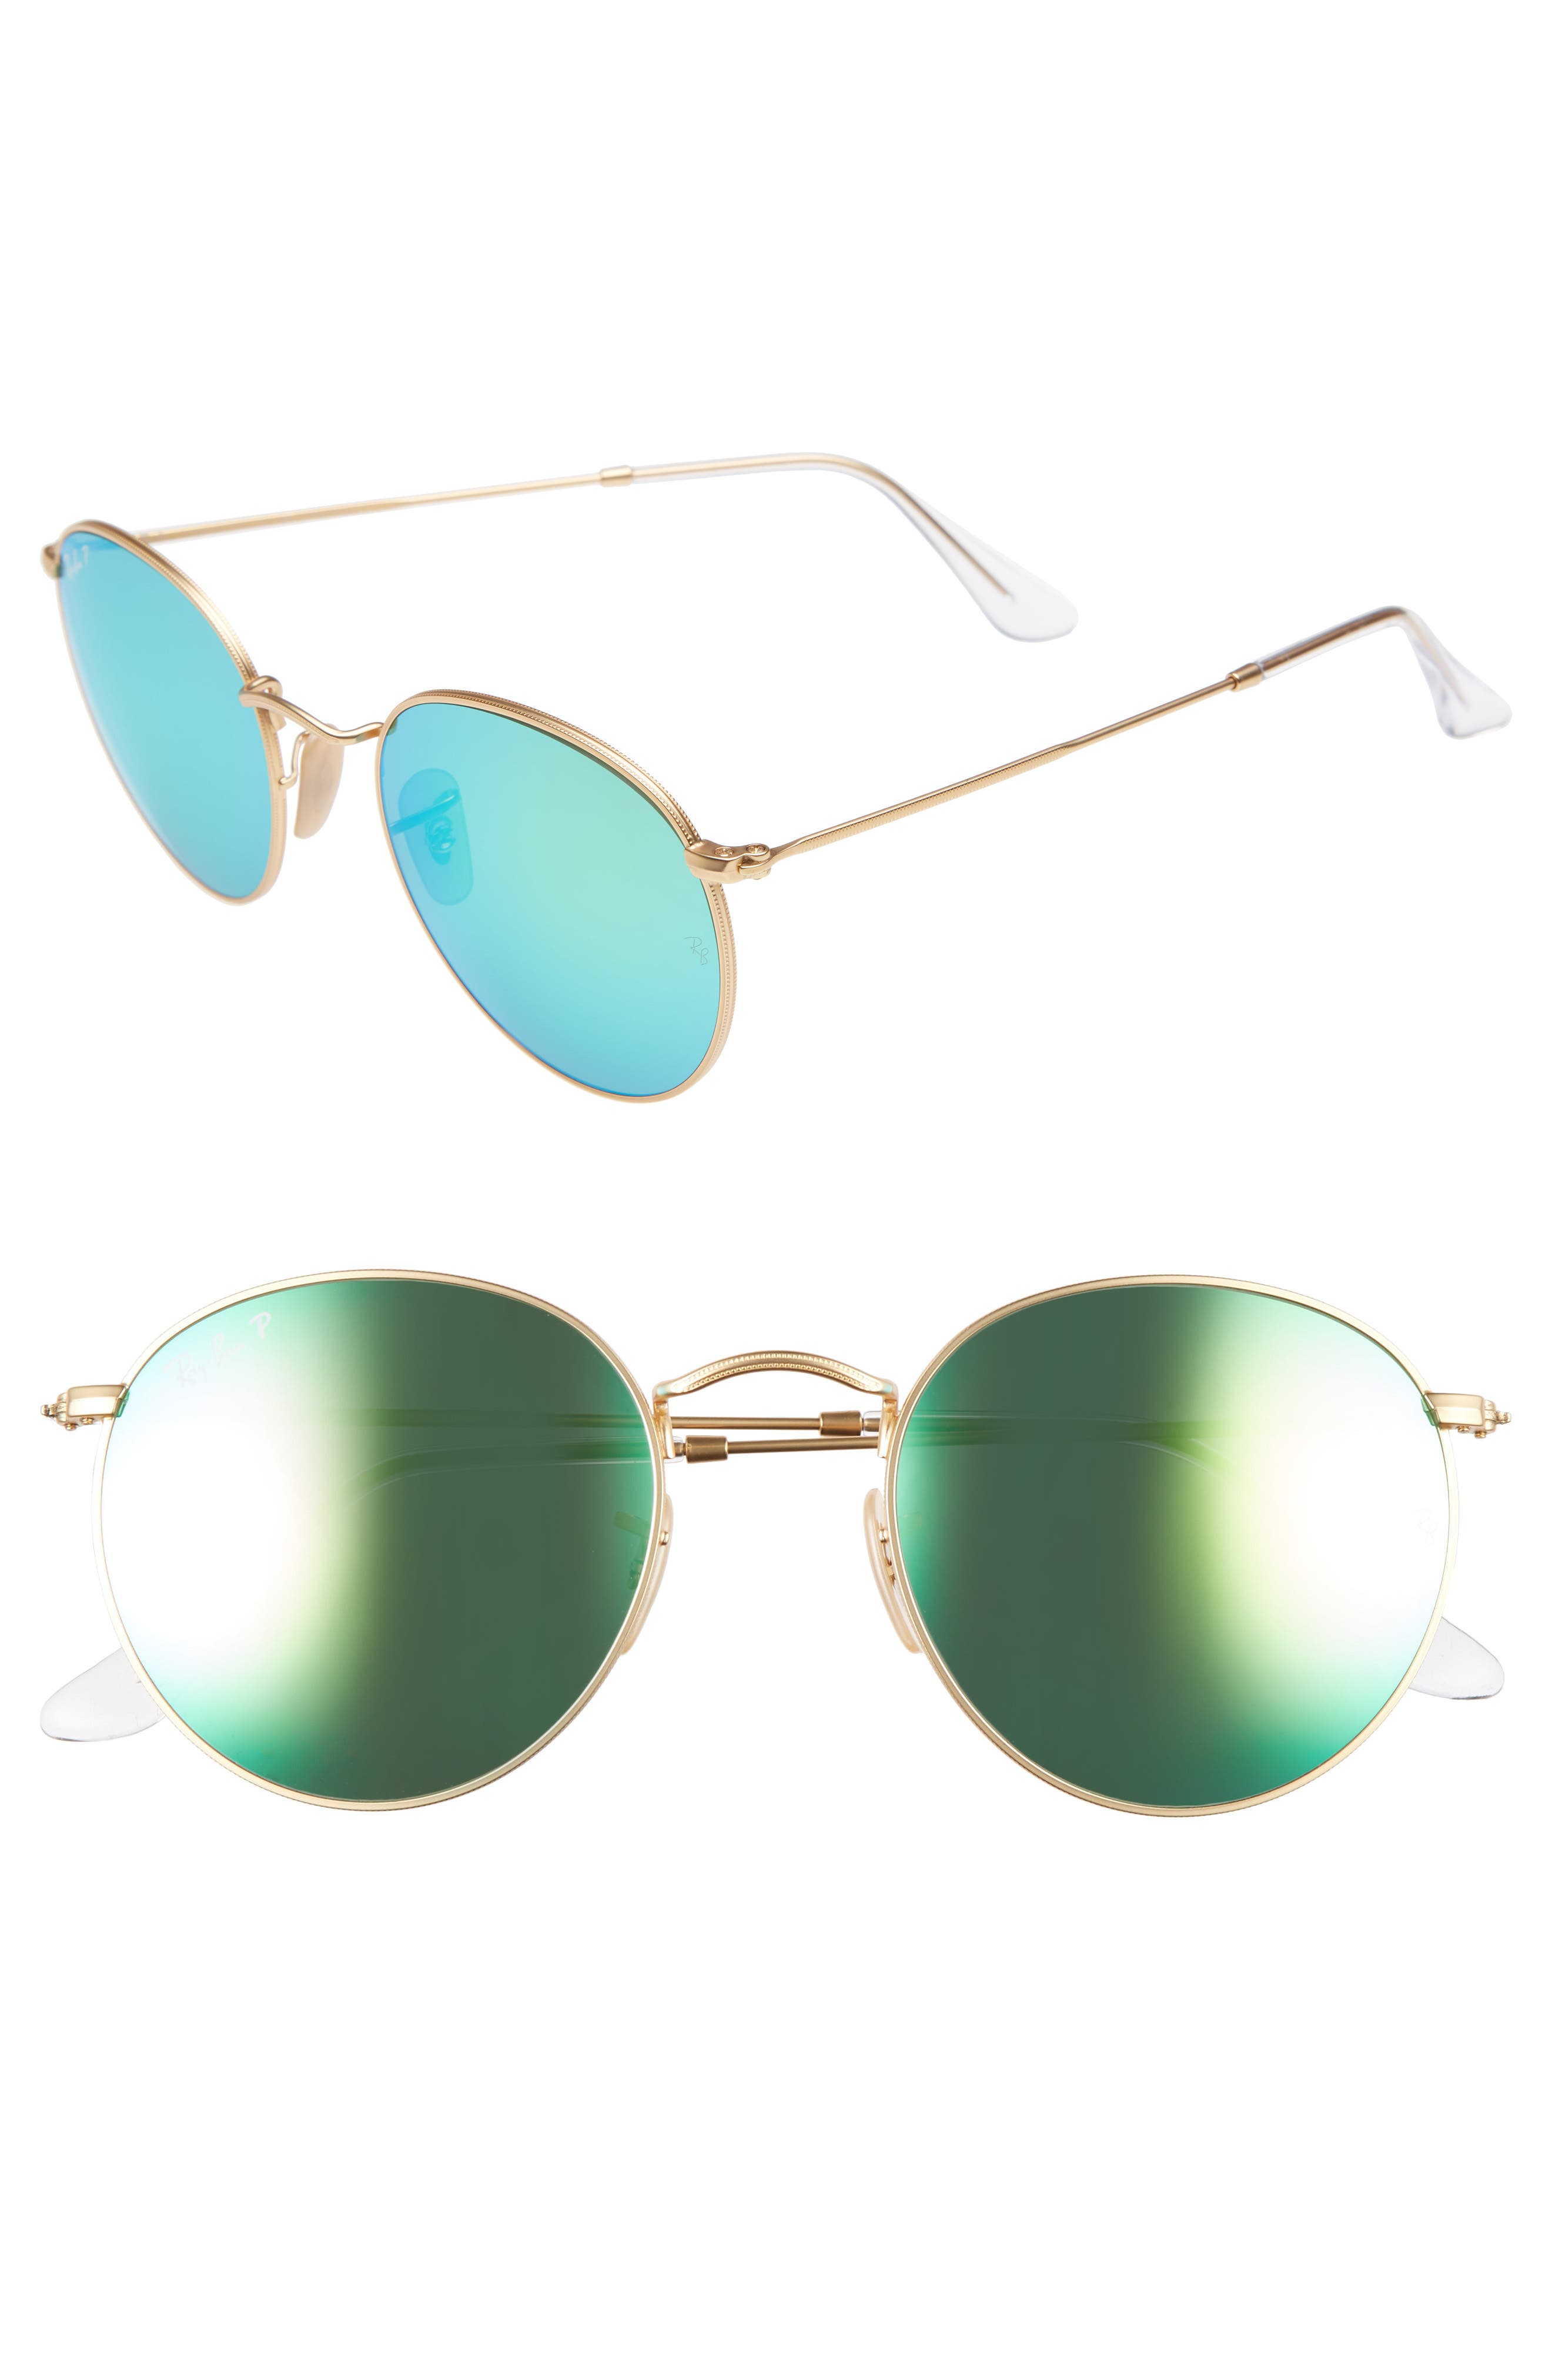 Alternate Image 1 Selected - Ray-Ban 53mm Polarized Round Retro Sunglasses